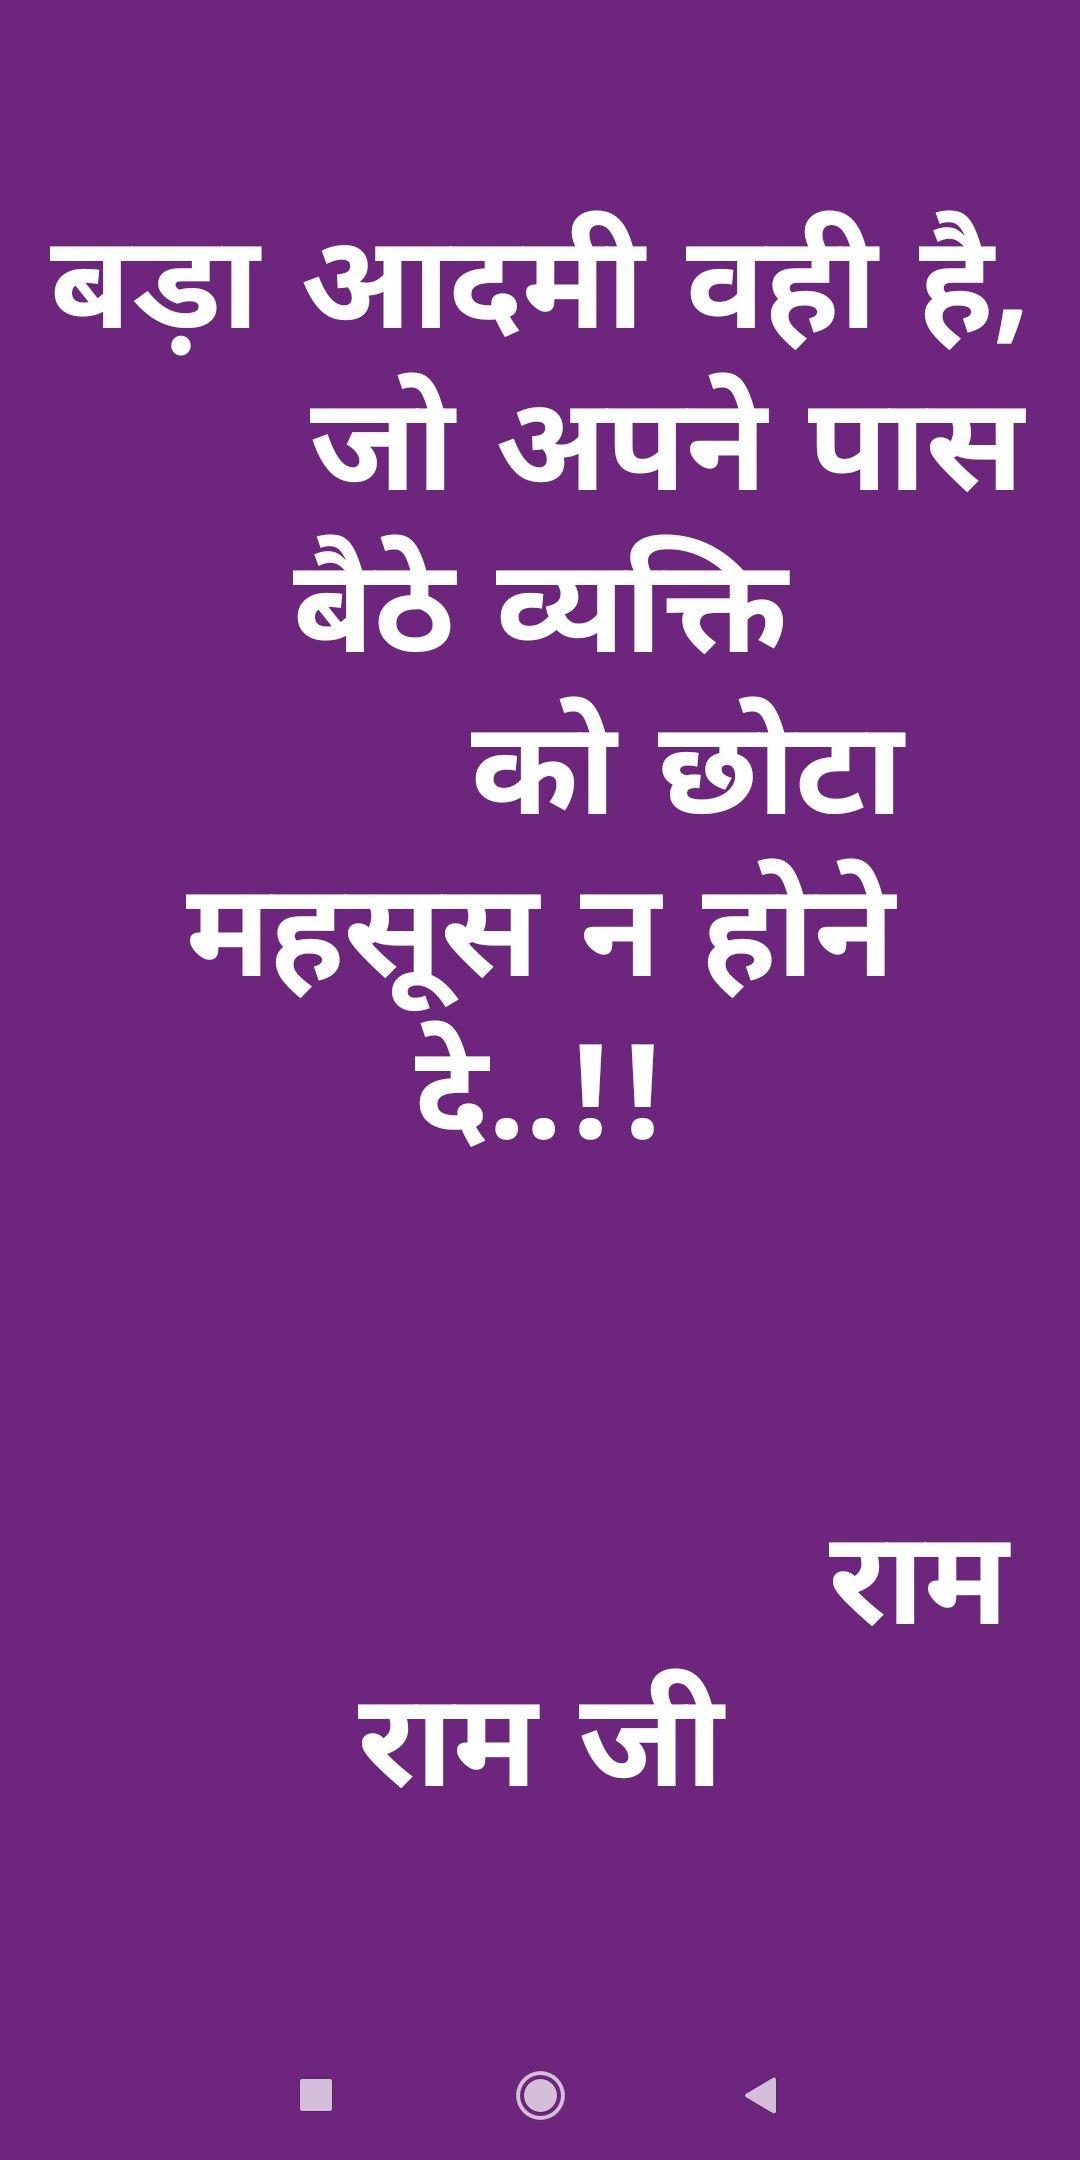 Pin By Sharma On Good Morning Sharma Hindi Quotes Quotes Knowledge